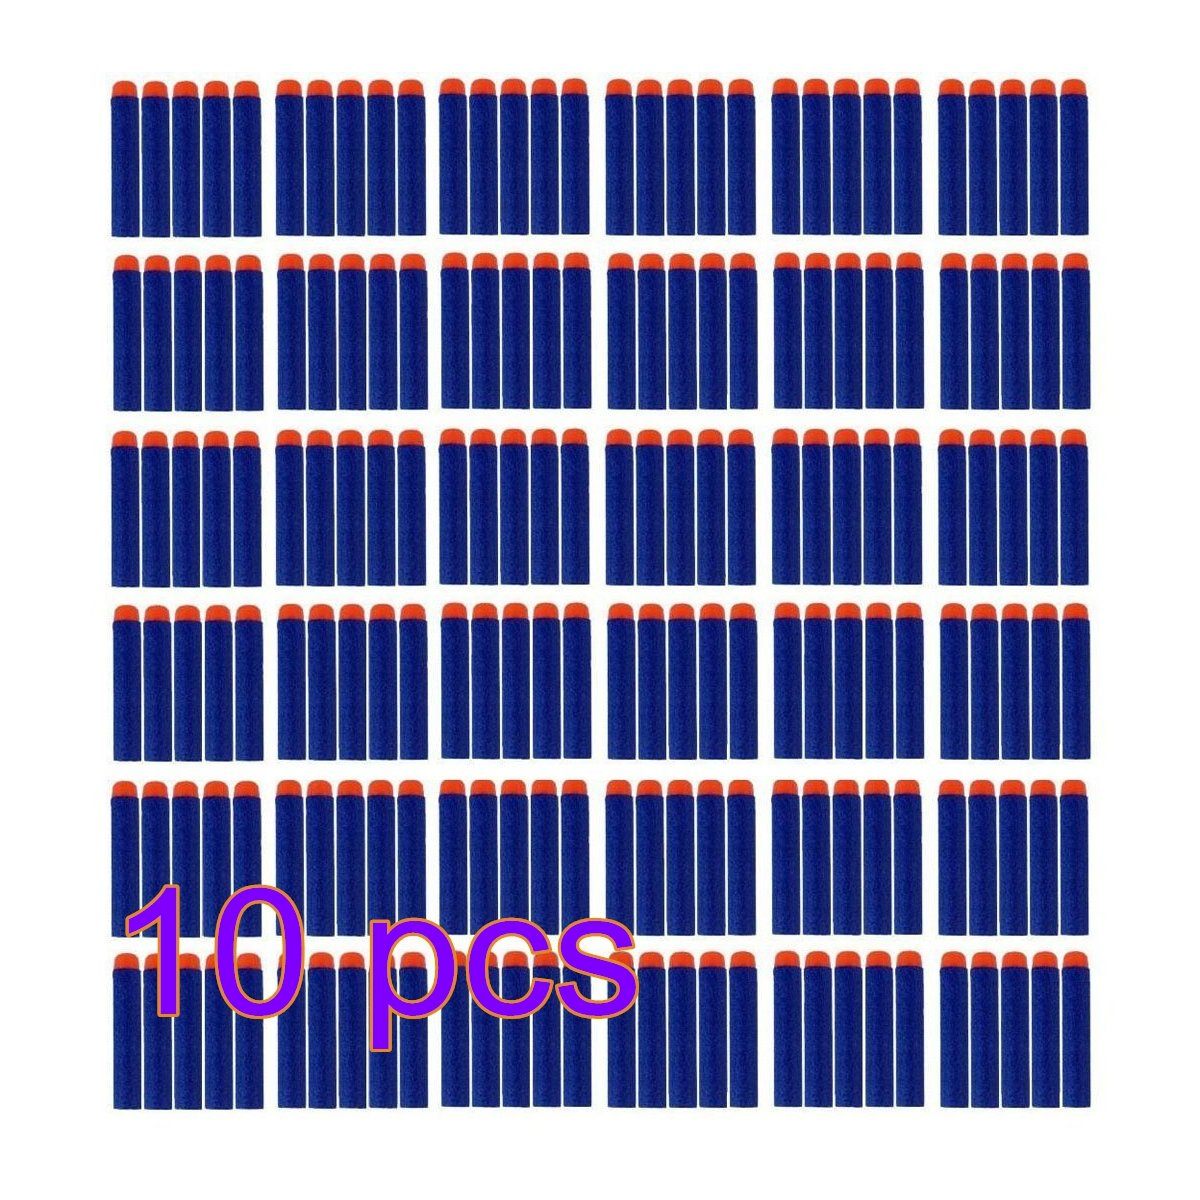 Tb_koop 100 Unids 7.2cm Espuma Obtusion Dardos Recarga Bola Nerf